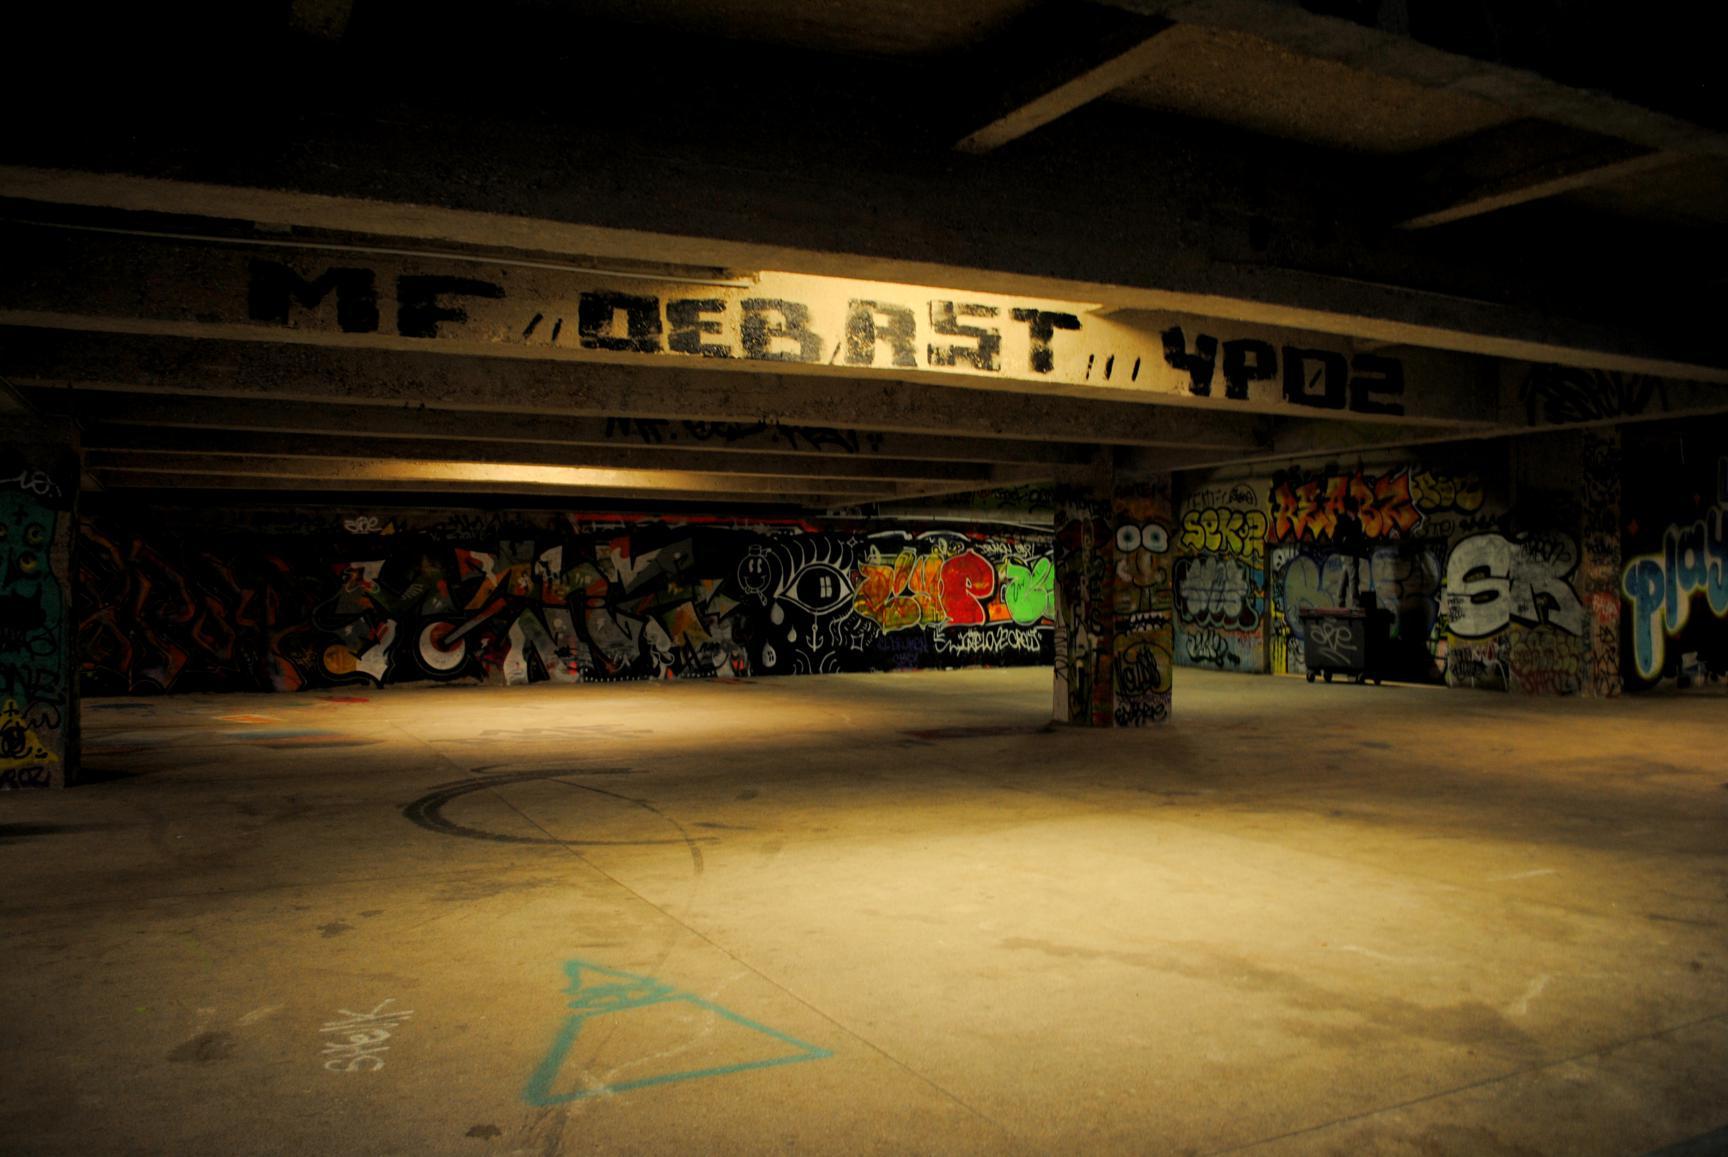 paris-bajos-grafittis-1